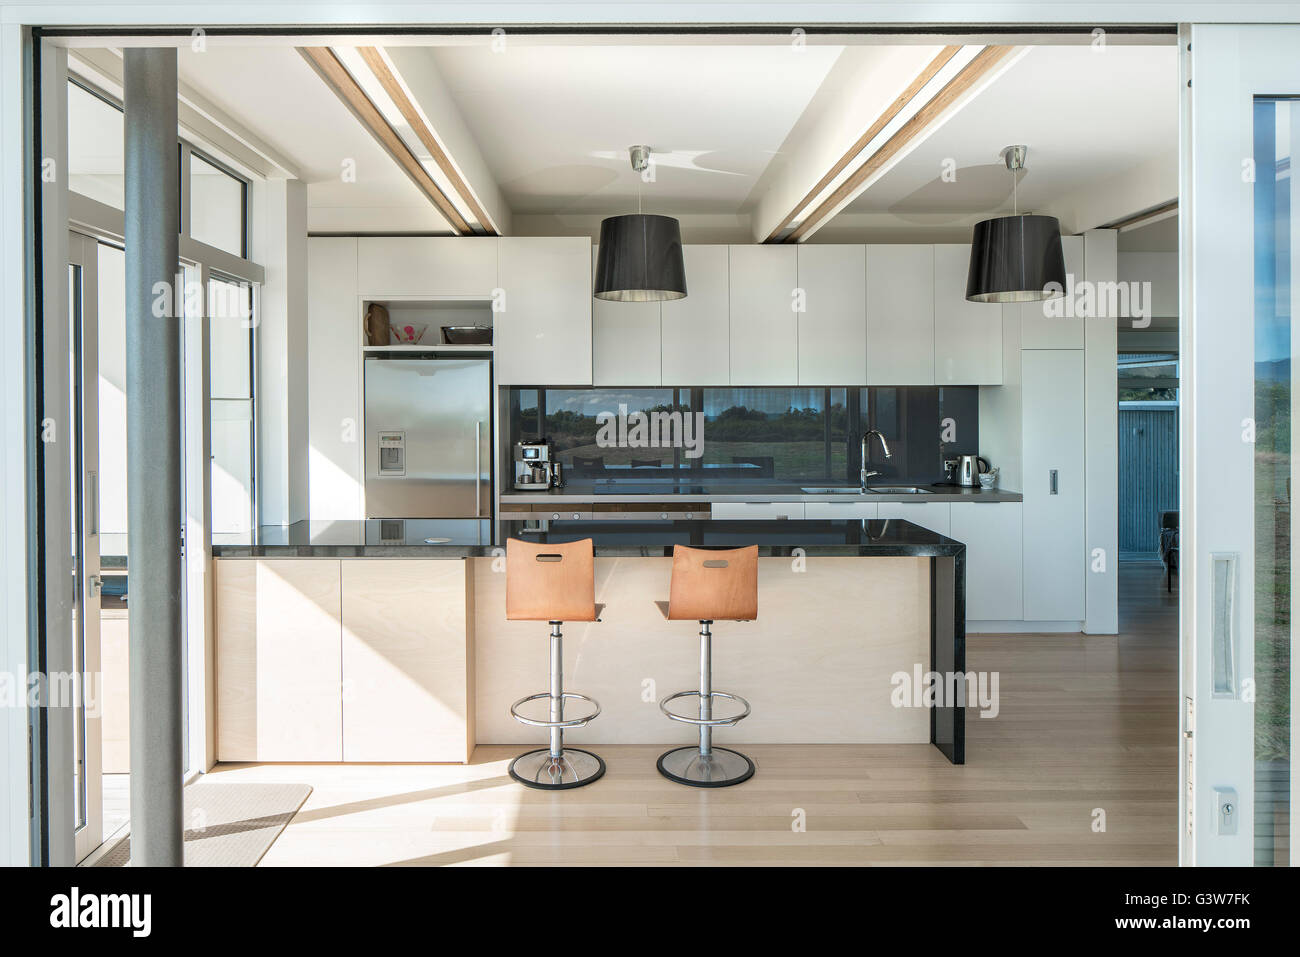 Kitchen through window. Waikanae House, Peka Peka - Kapiti Coast, New Zealand. Architect: Herriot Meluish Architects, Stock Photo